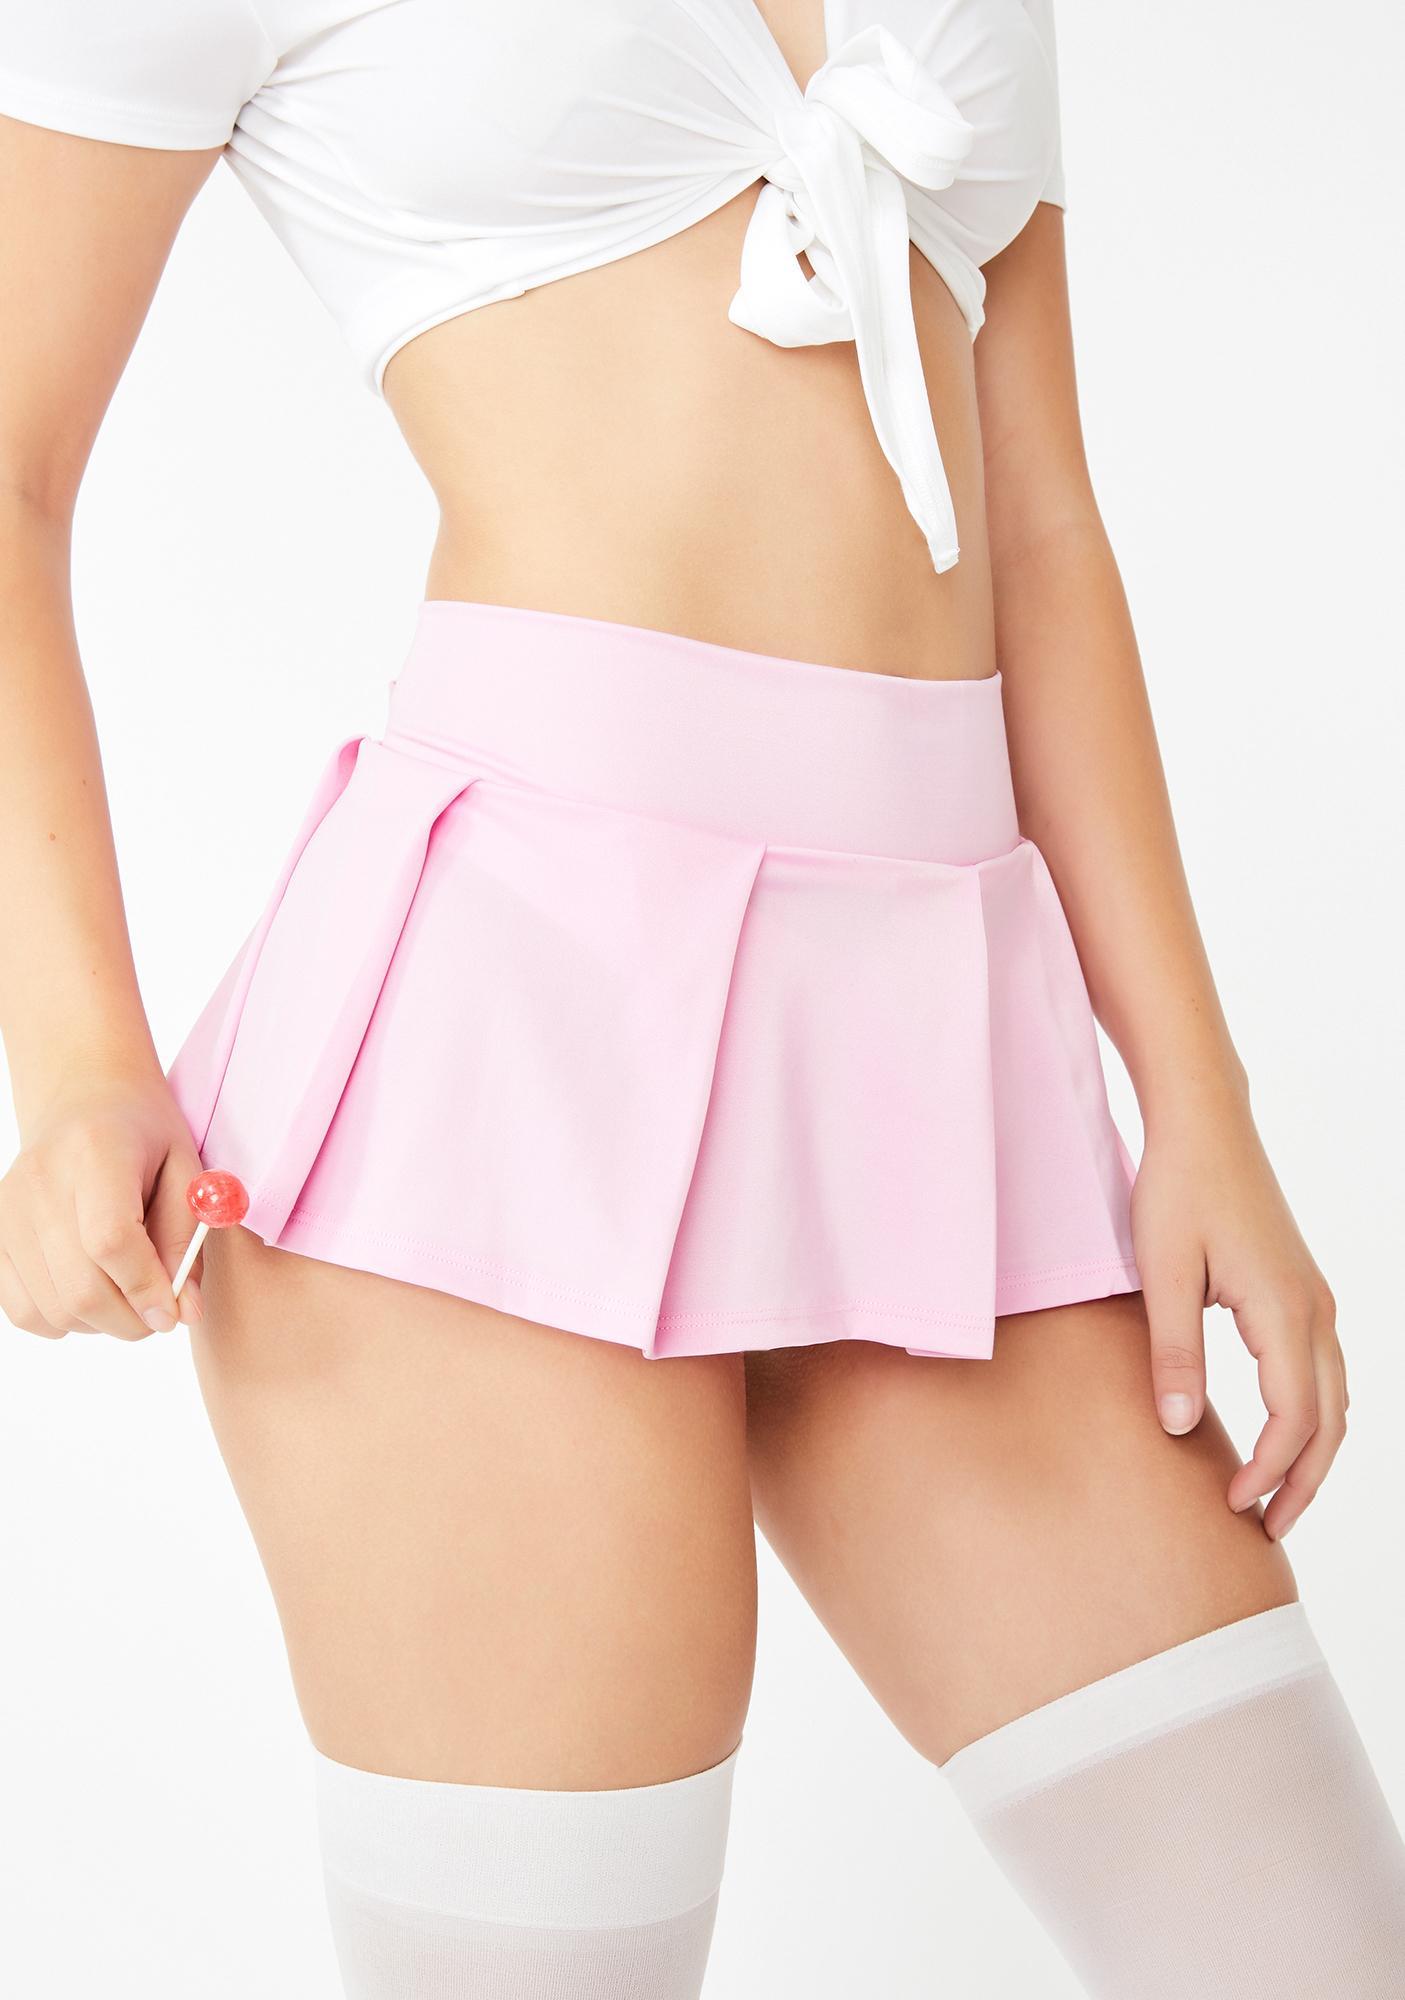 Tease Me Please Mini Skirt